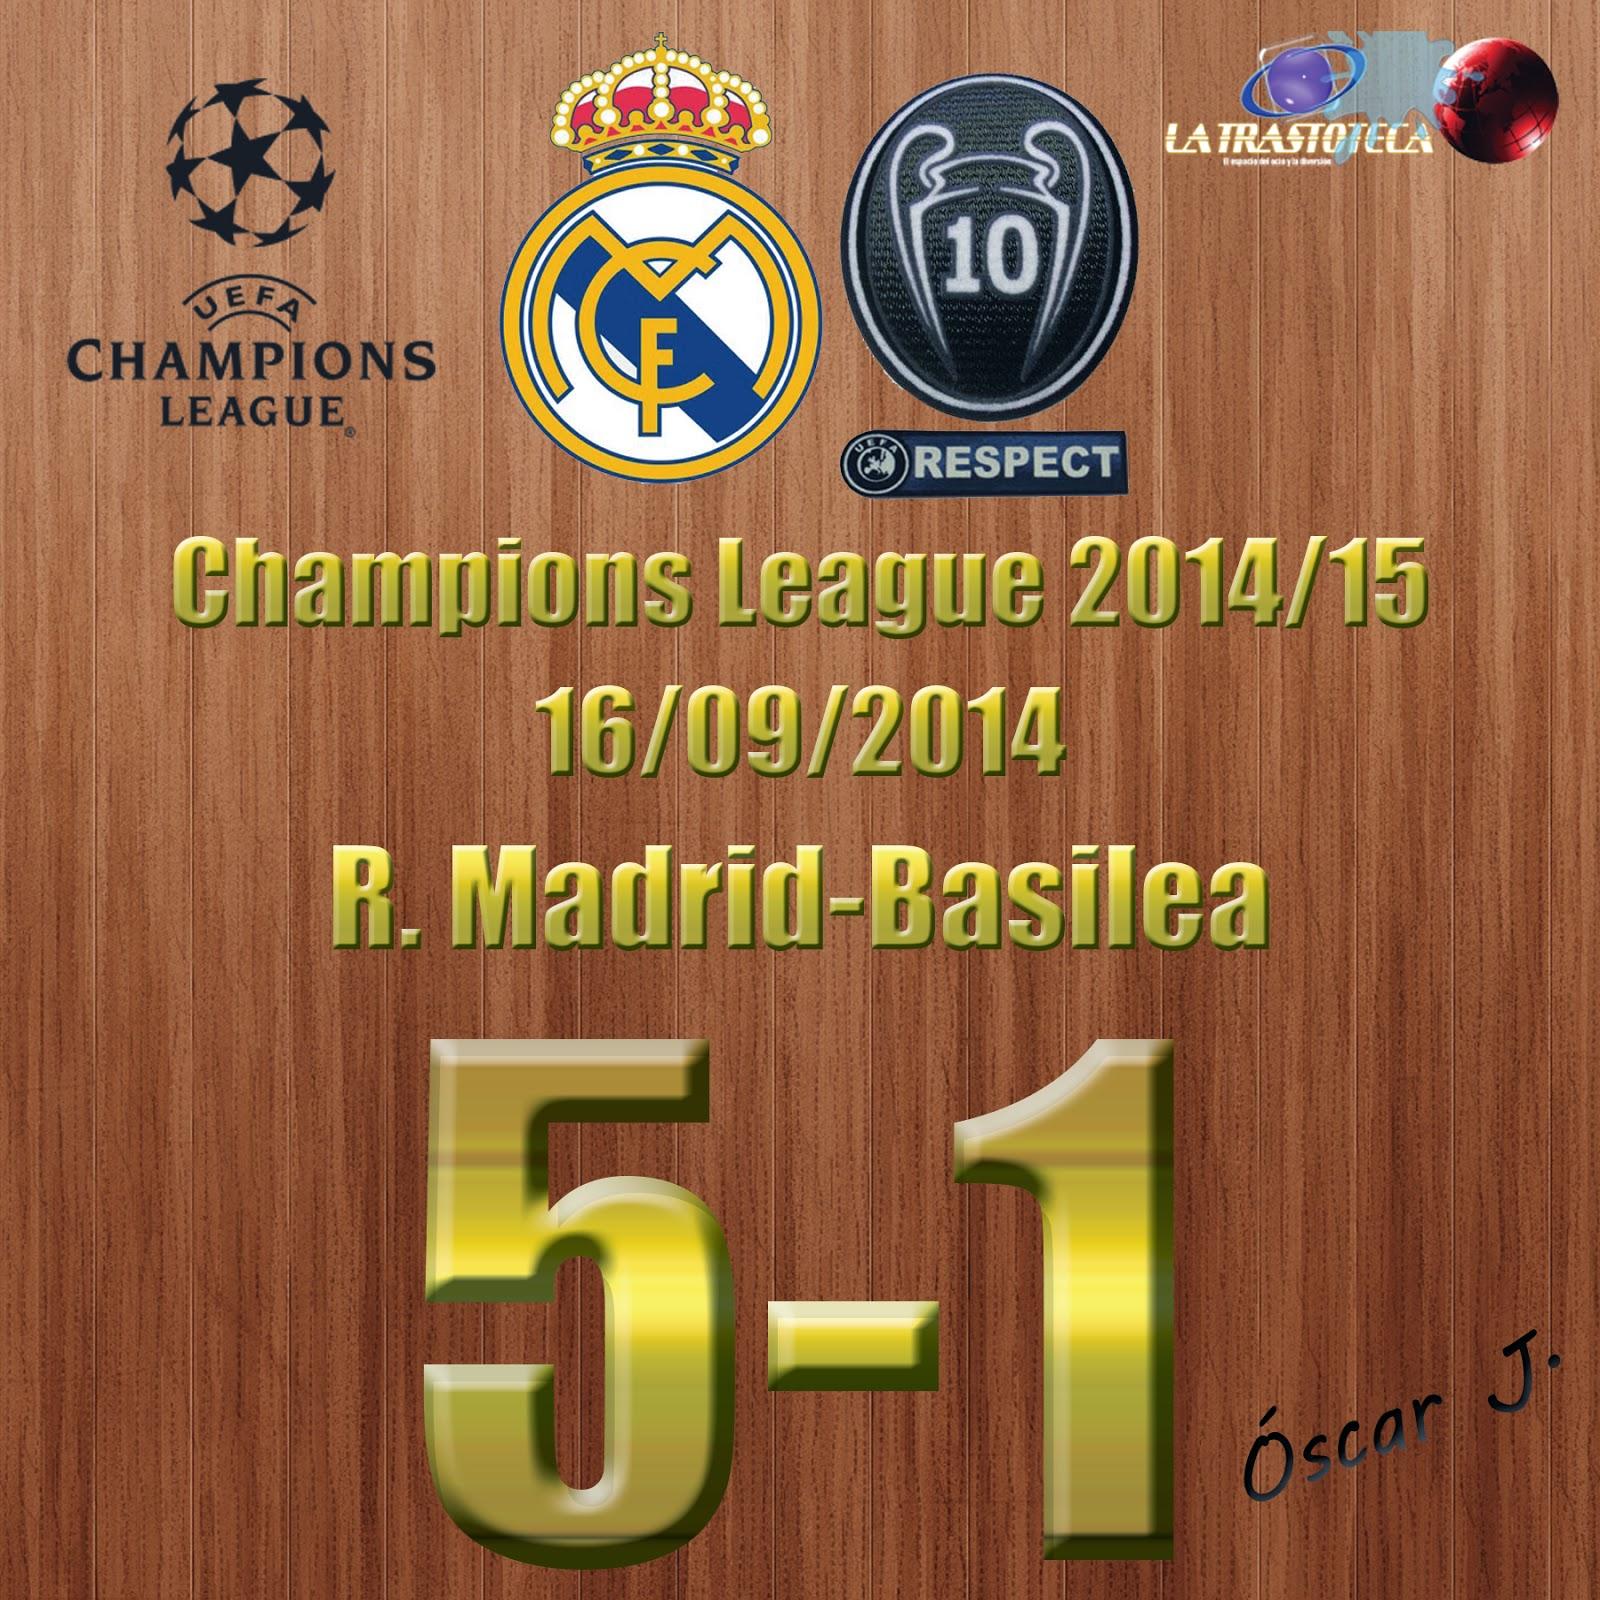 Real Madrid 5-1 Basilea